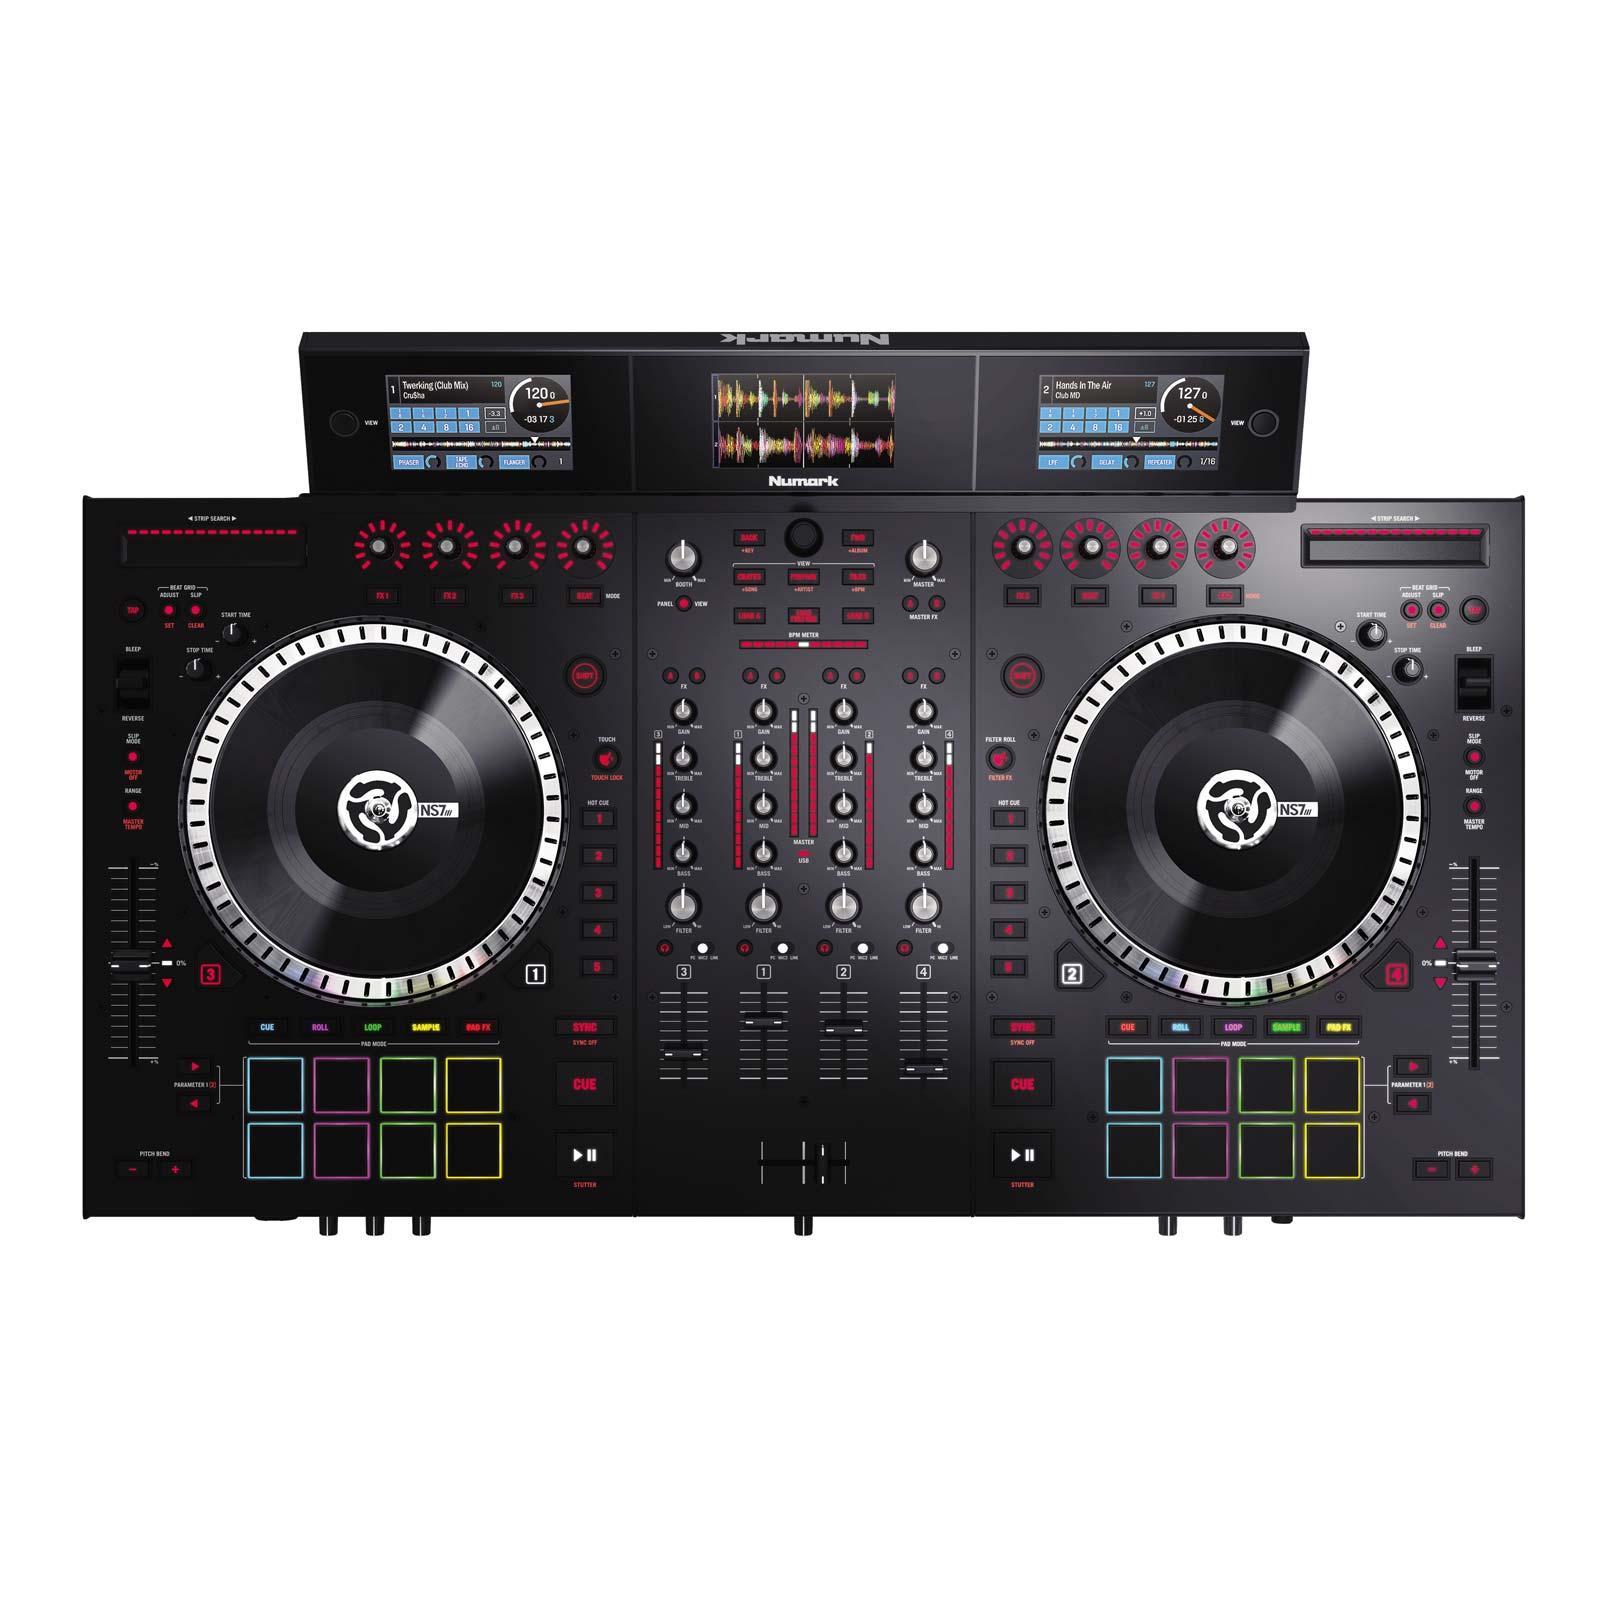 NUMARK NS7III | 4-Deck Serato DJ Controller with 3-Screen ...